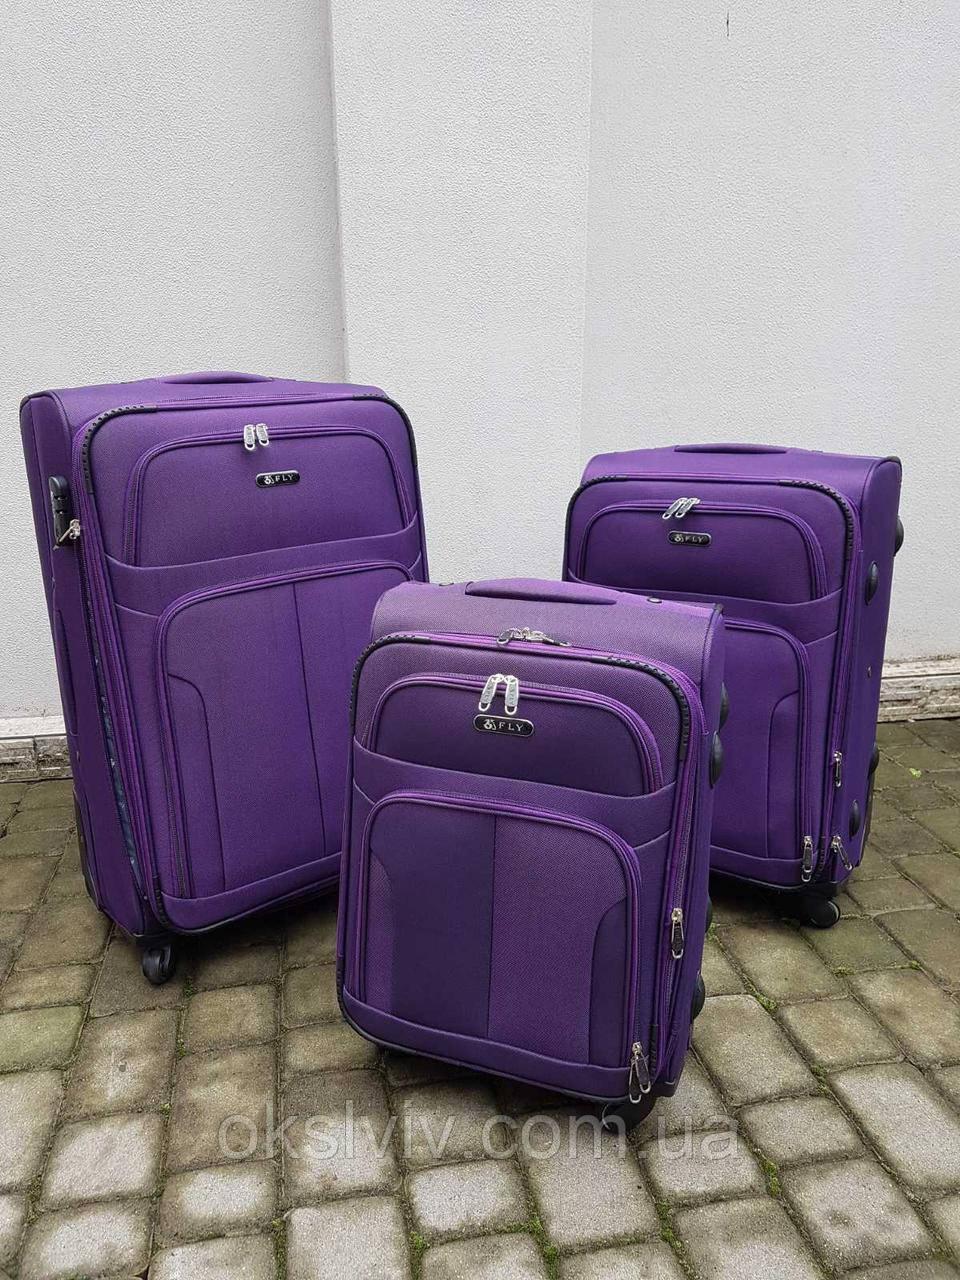 FLY 8303 Польща на 4-х колесах валізи чемоданы сумки на колесах